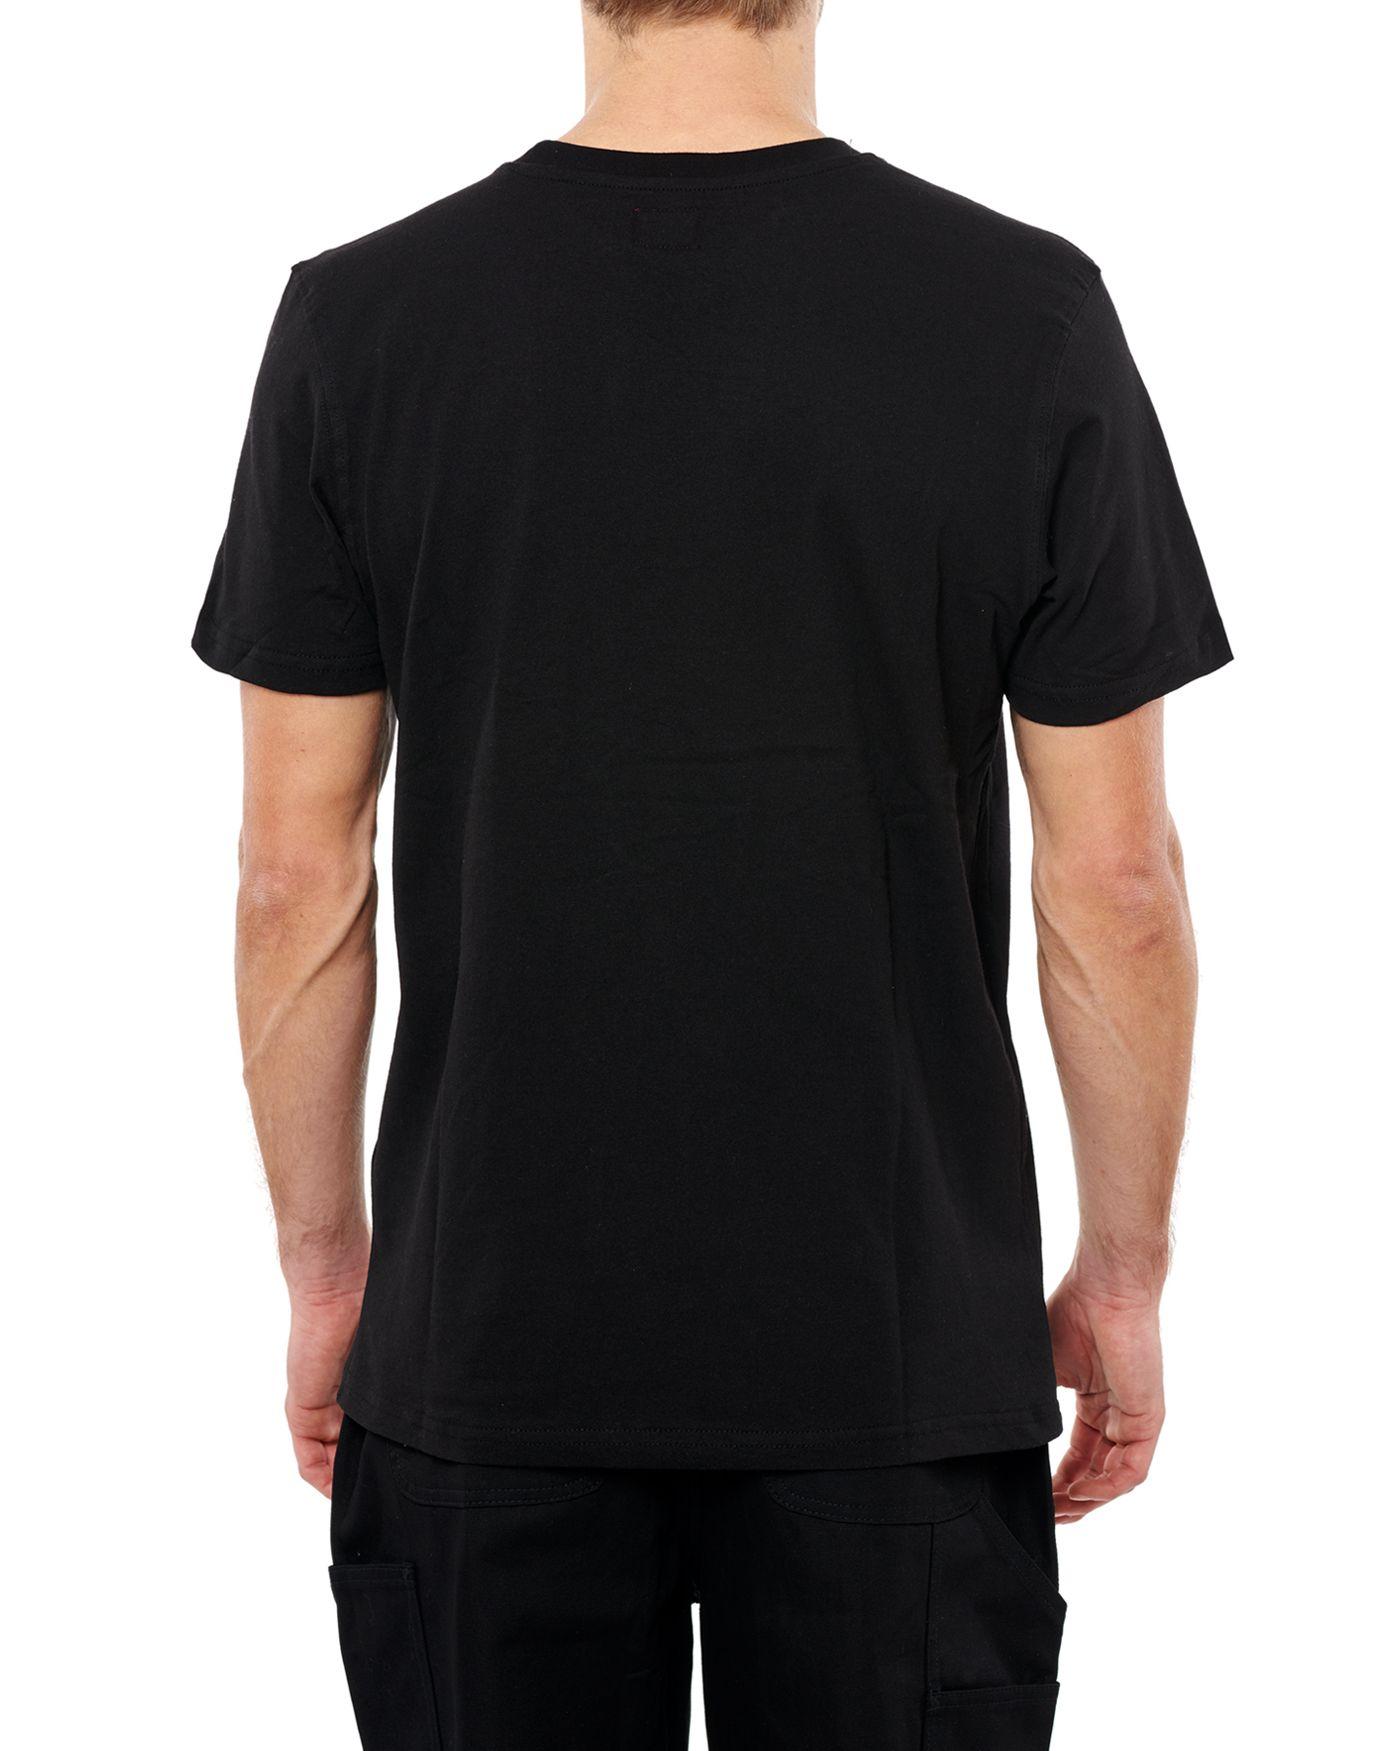 Photo of Pony Boy S/S T-shirt, Black